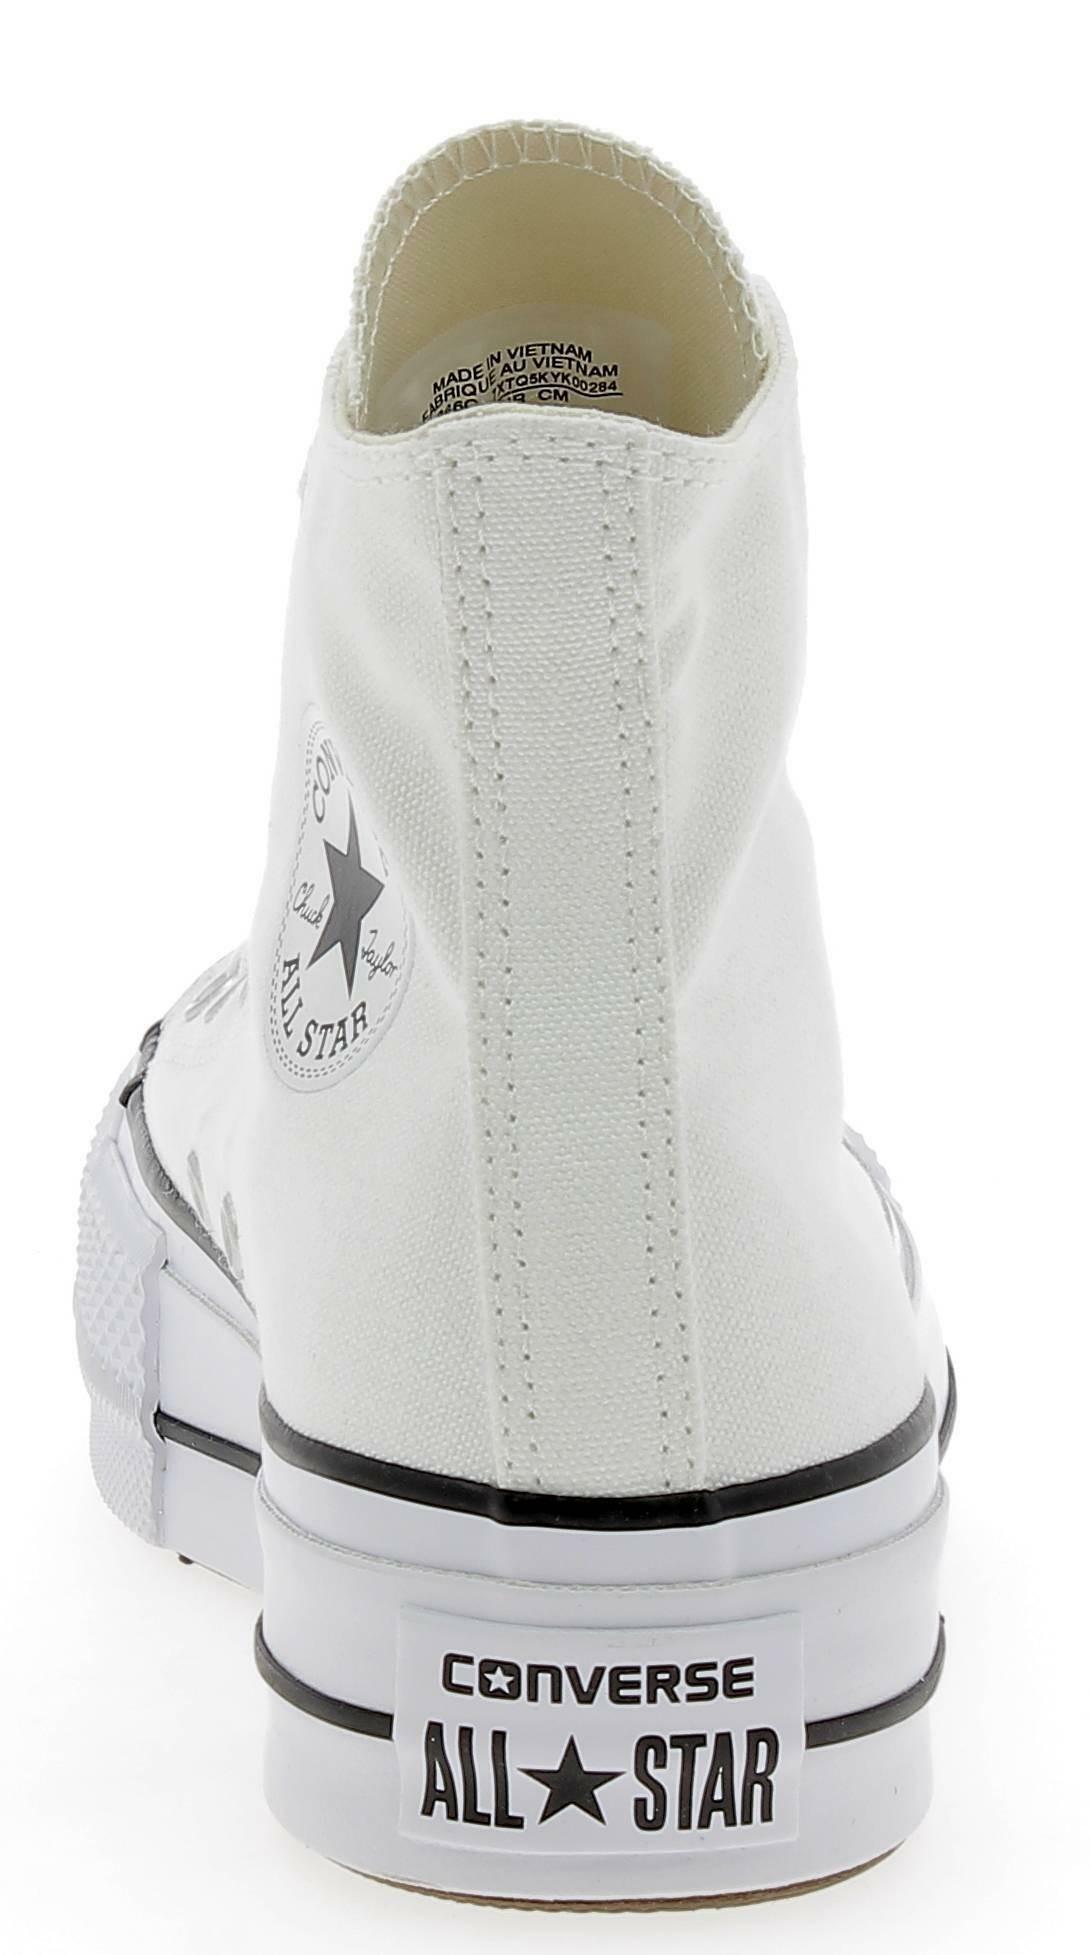 converse converse ctas lift hi platform scarpe sportive donna bianche